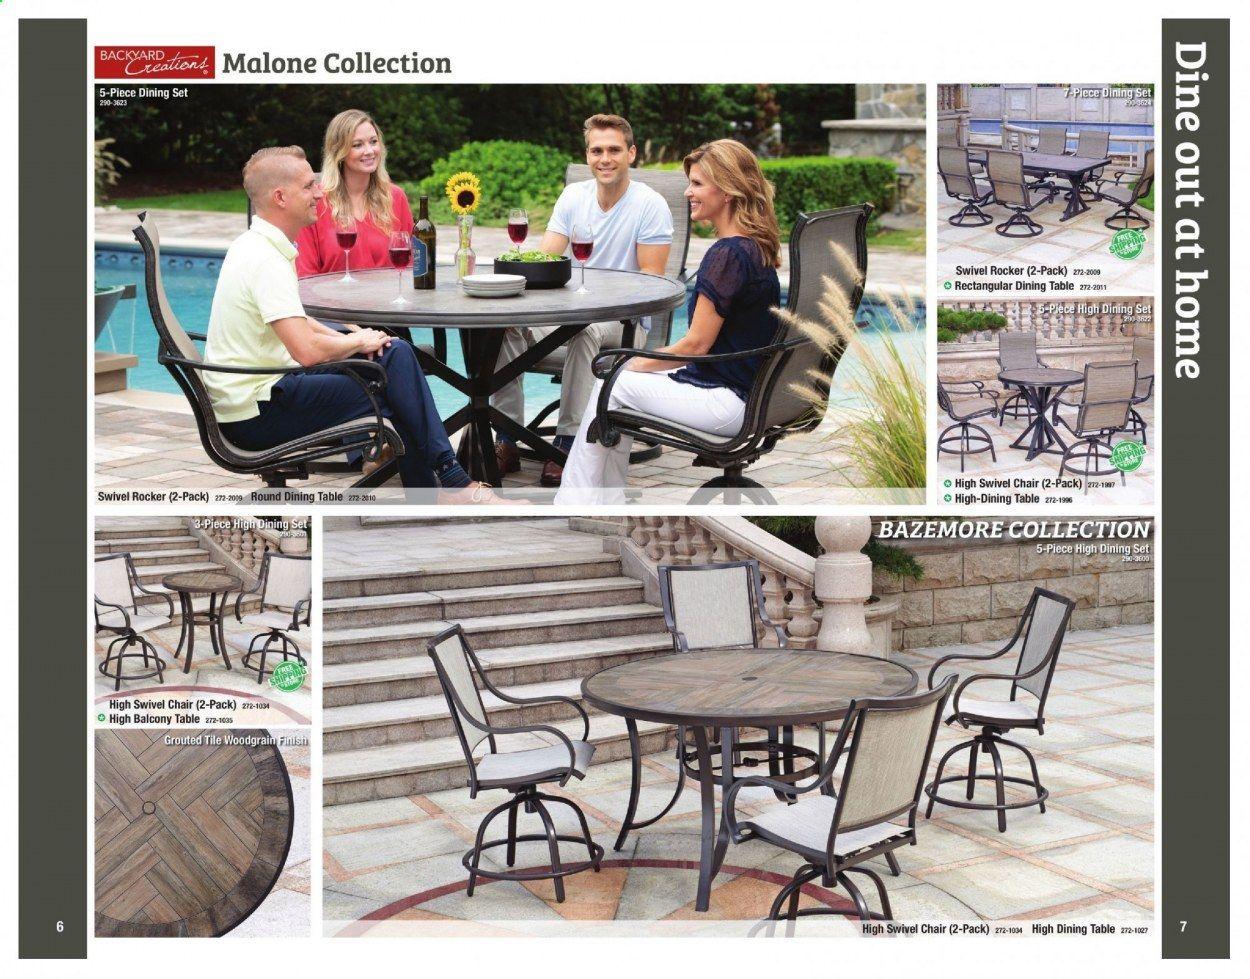 Menards Outdoor Living Catalog 2021 - Page 4